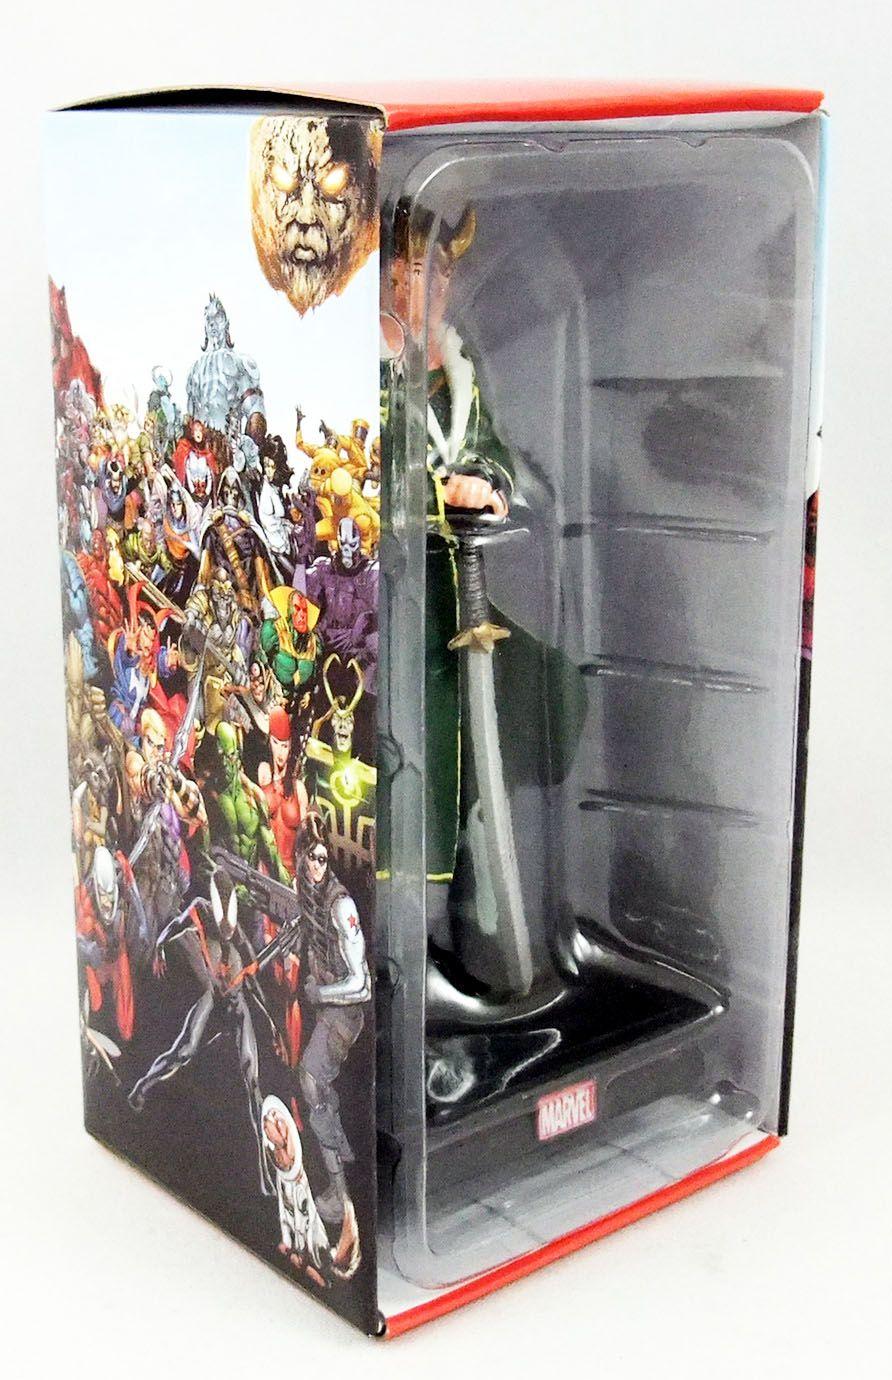 Marvel Super Heroes Collection - Panini Comics - #18 Loki